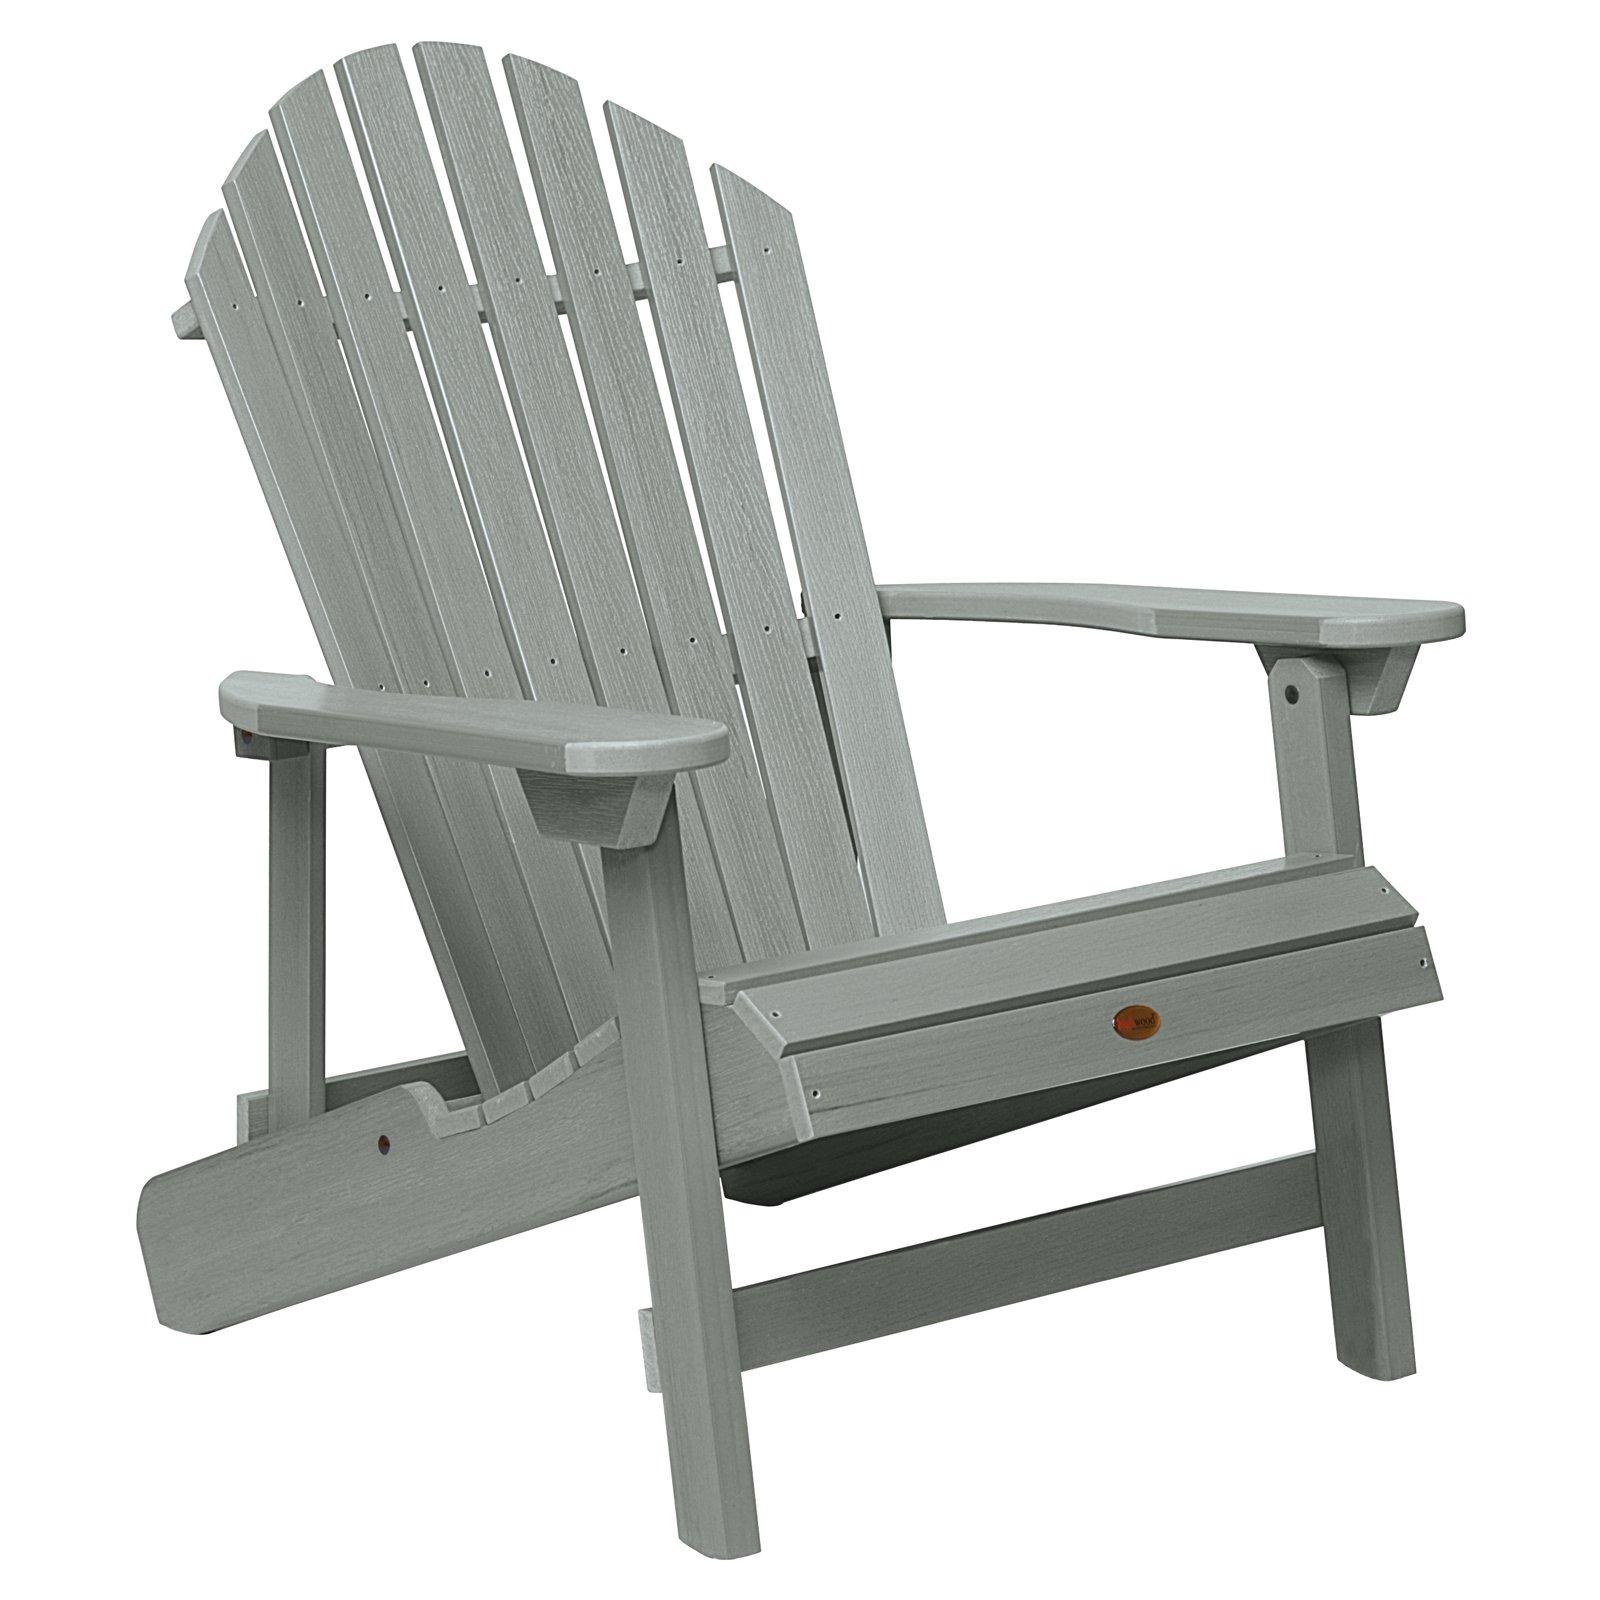 highwood KING Hamilton Folding & Reclining Adirondack Chair by Adirondack Furniture